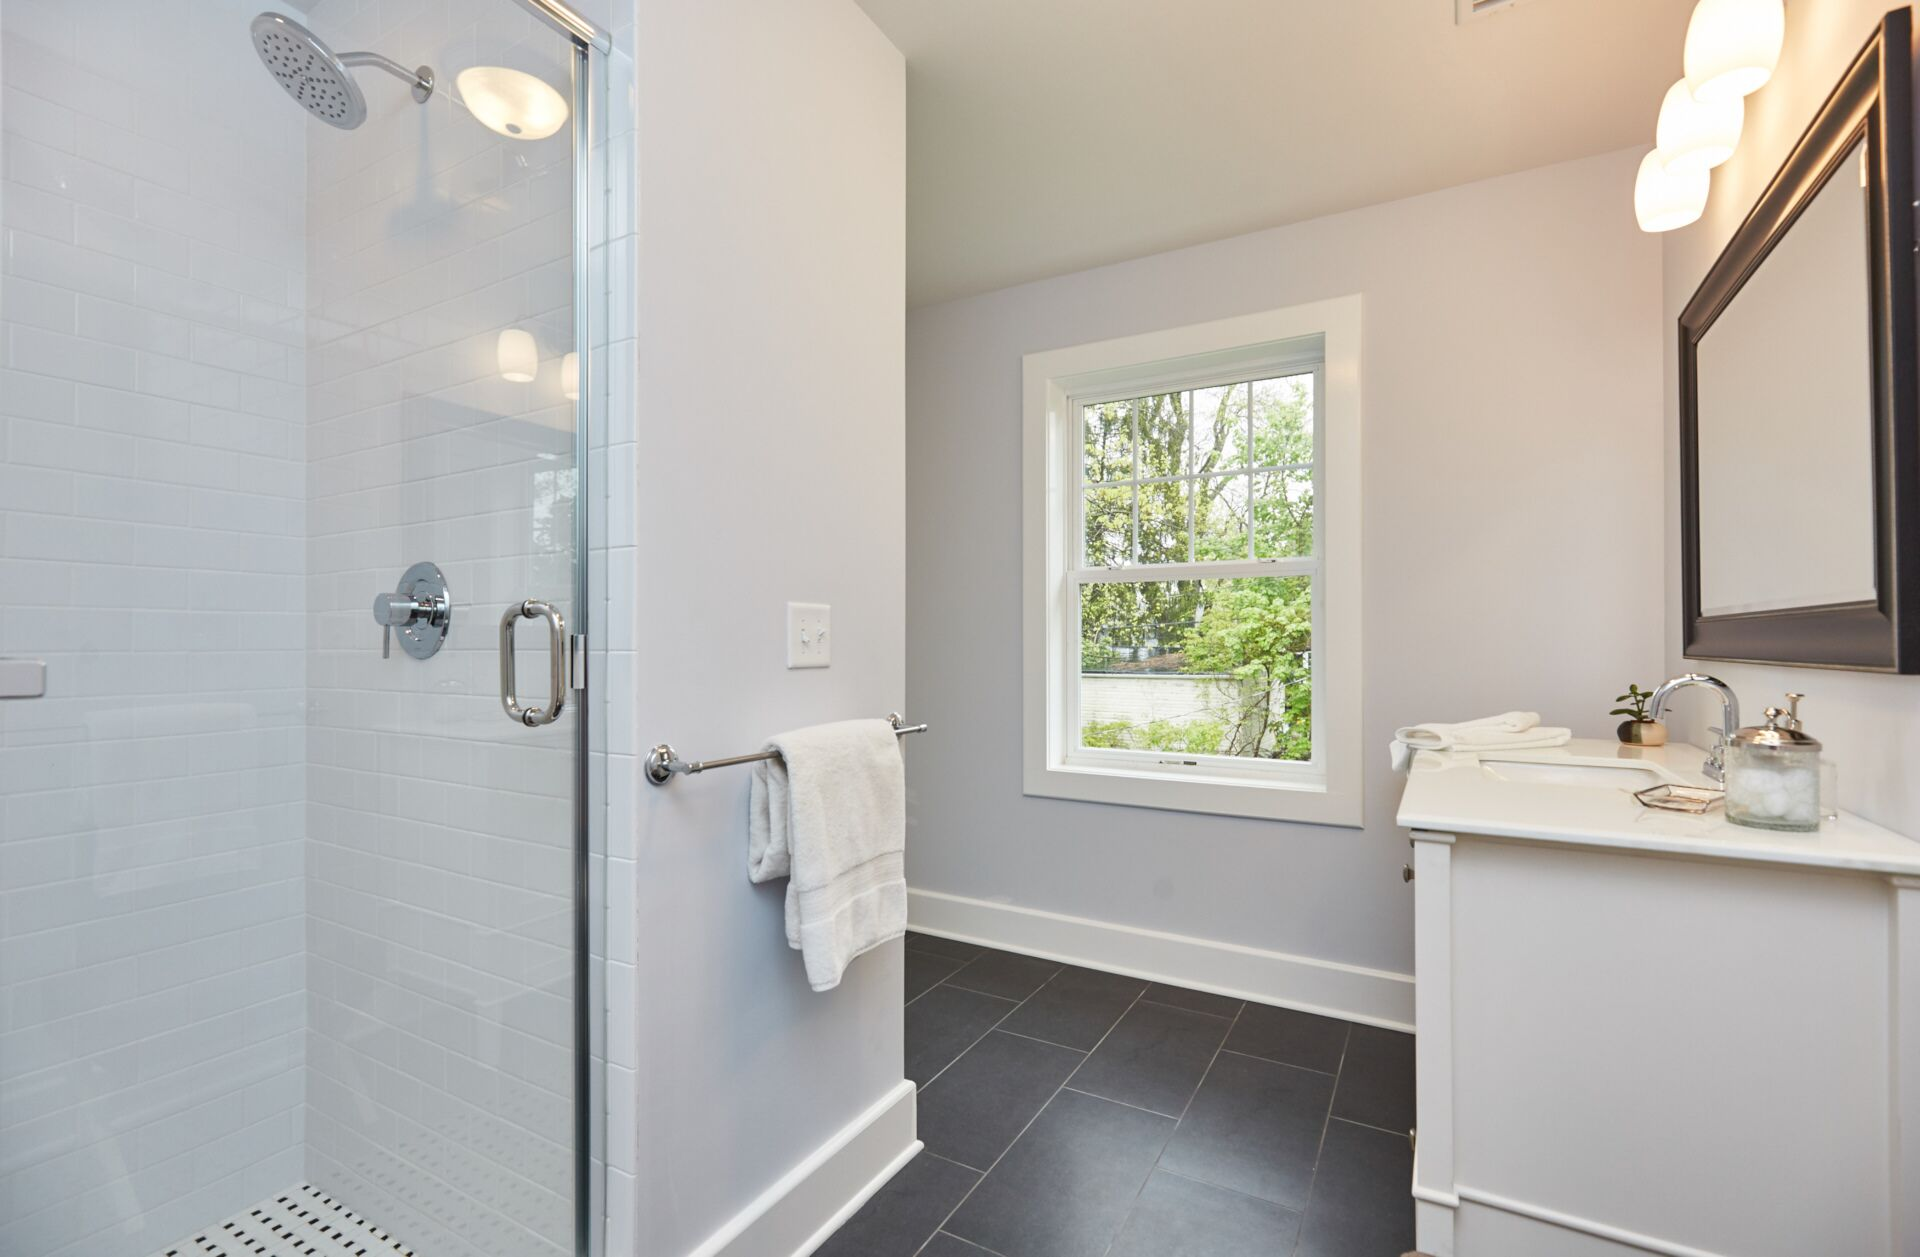 7 Spa-like Master Bath